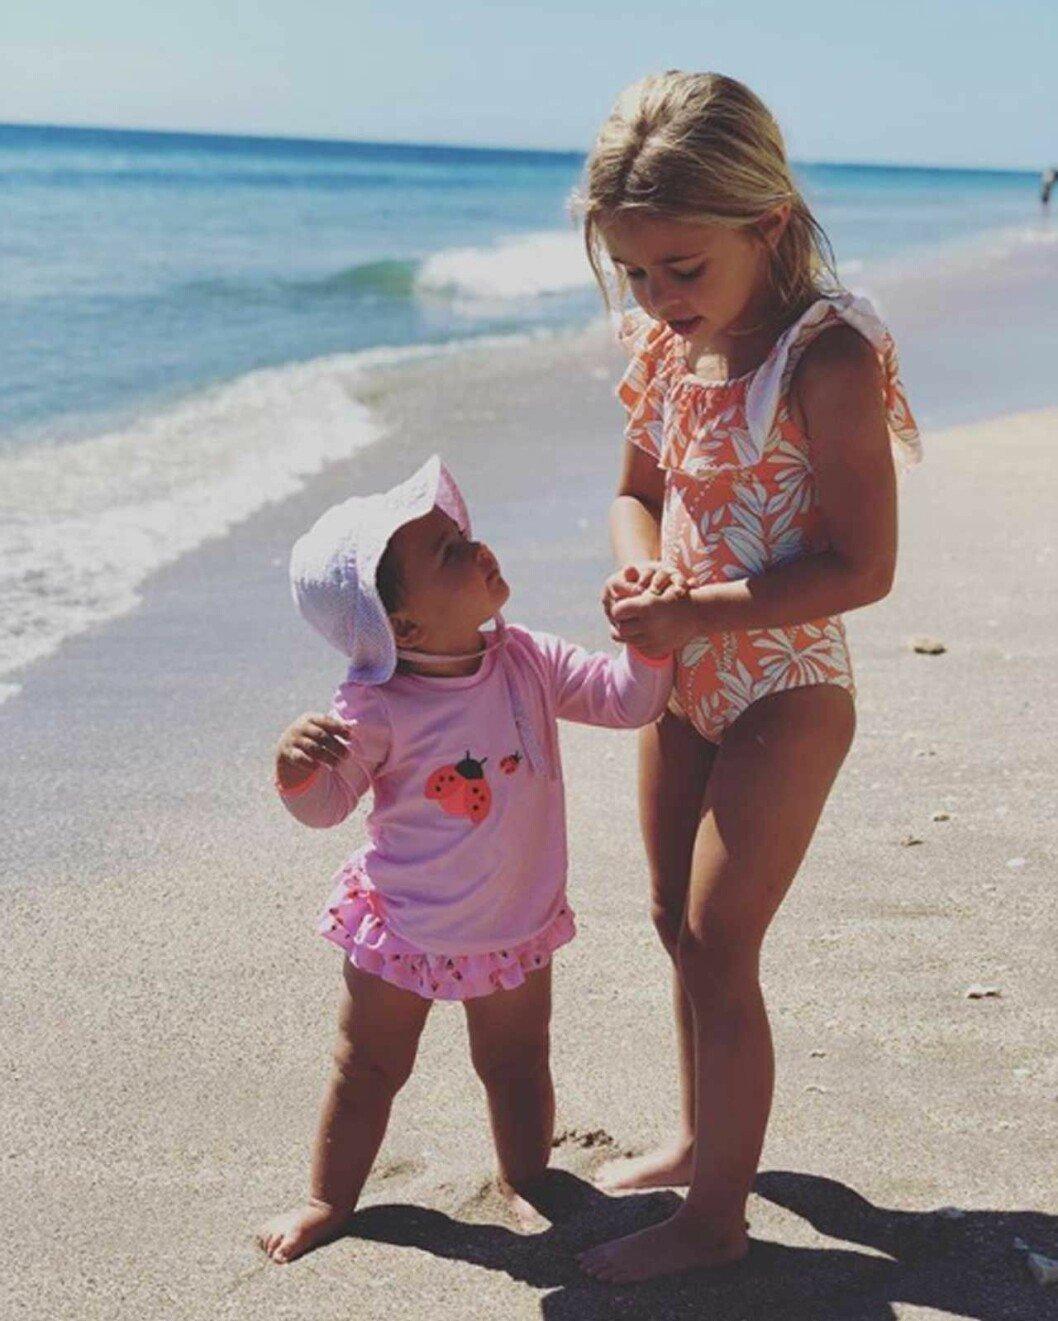 Miami-prinsessan Leonore på stranden med sin lillasyster Adrienne.